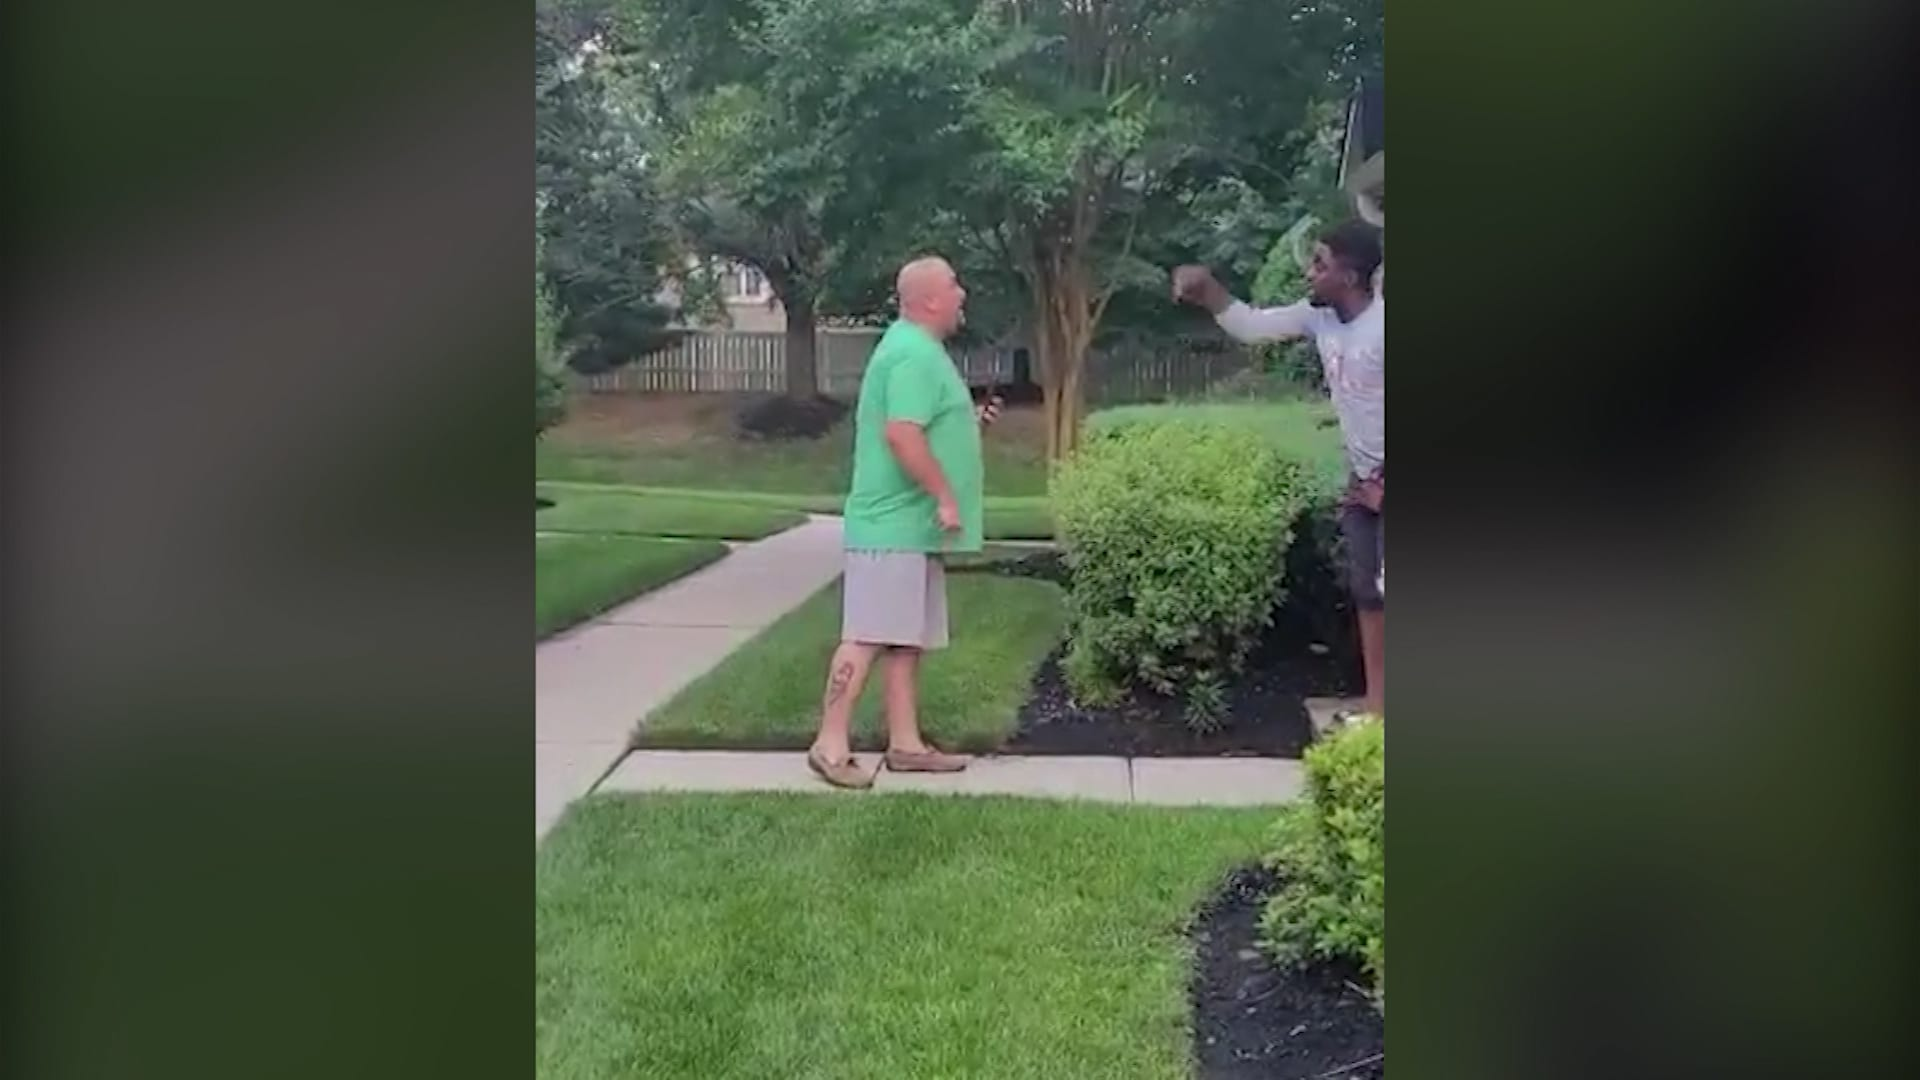 شاهد.. اعتقال رجل أمريكي بعد تداول فيديو عنصري له